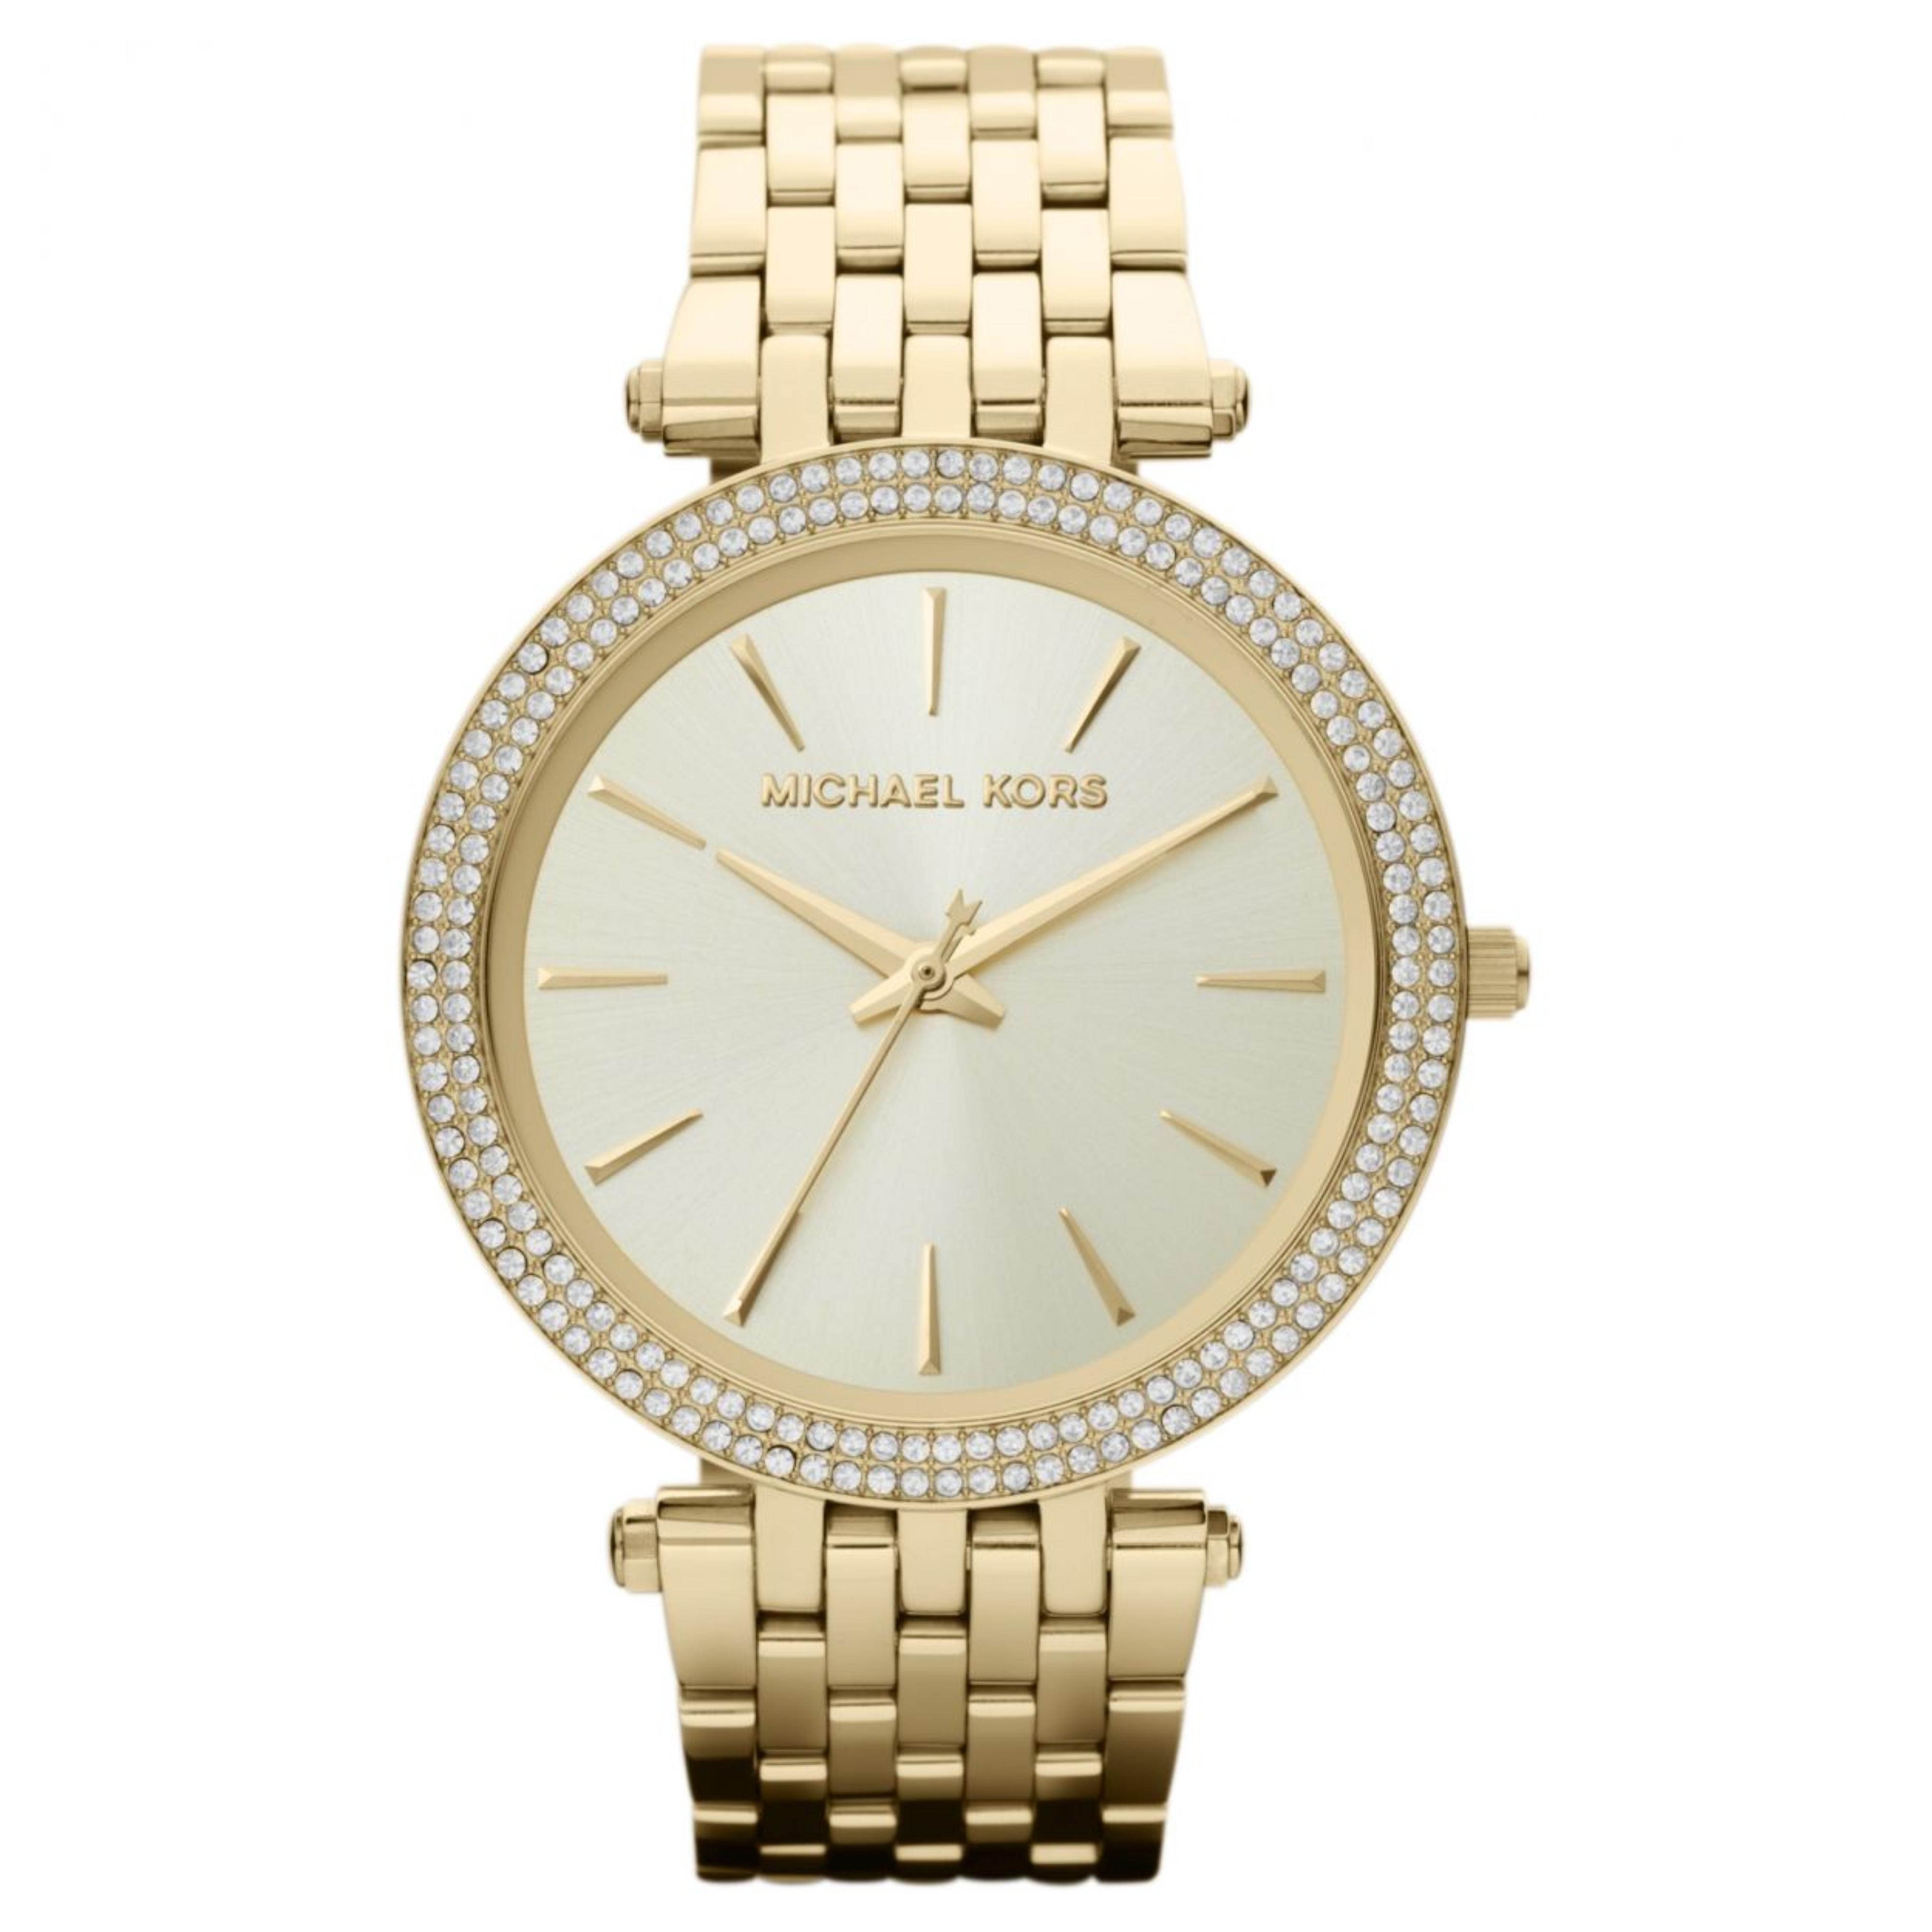 Michael Kors Darci Ladies Watch|Gold Tone Dial Pave Bezel|Bracelet Band|MK3191